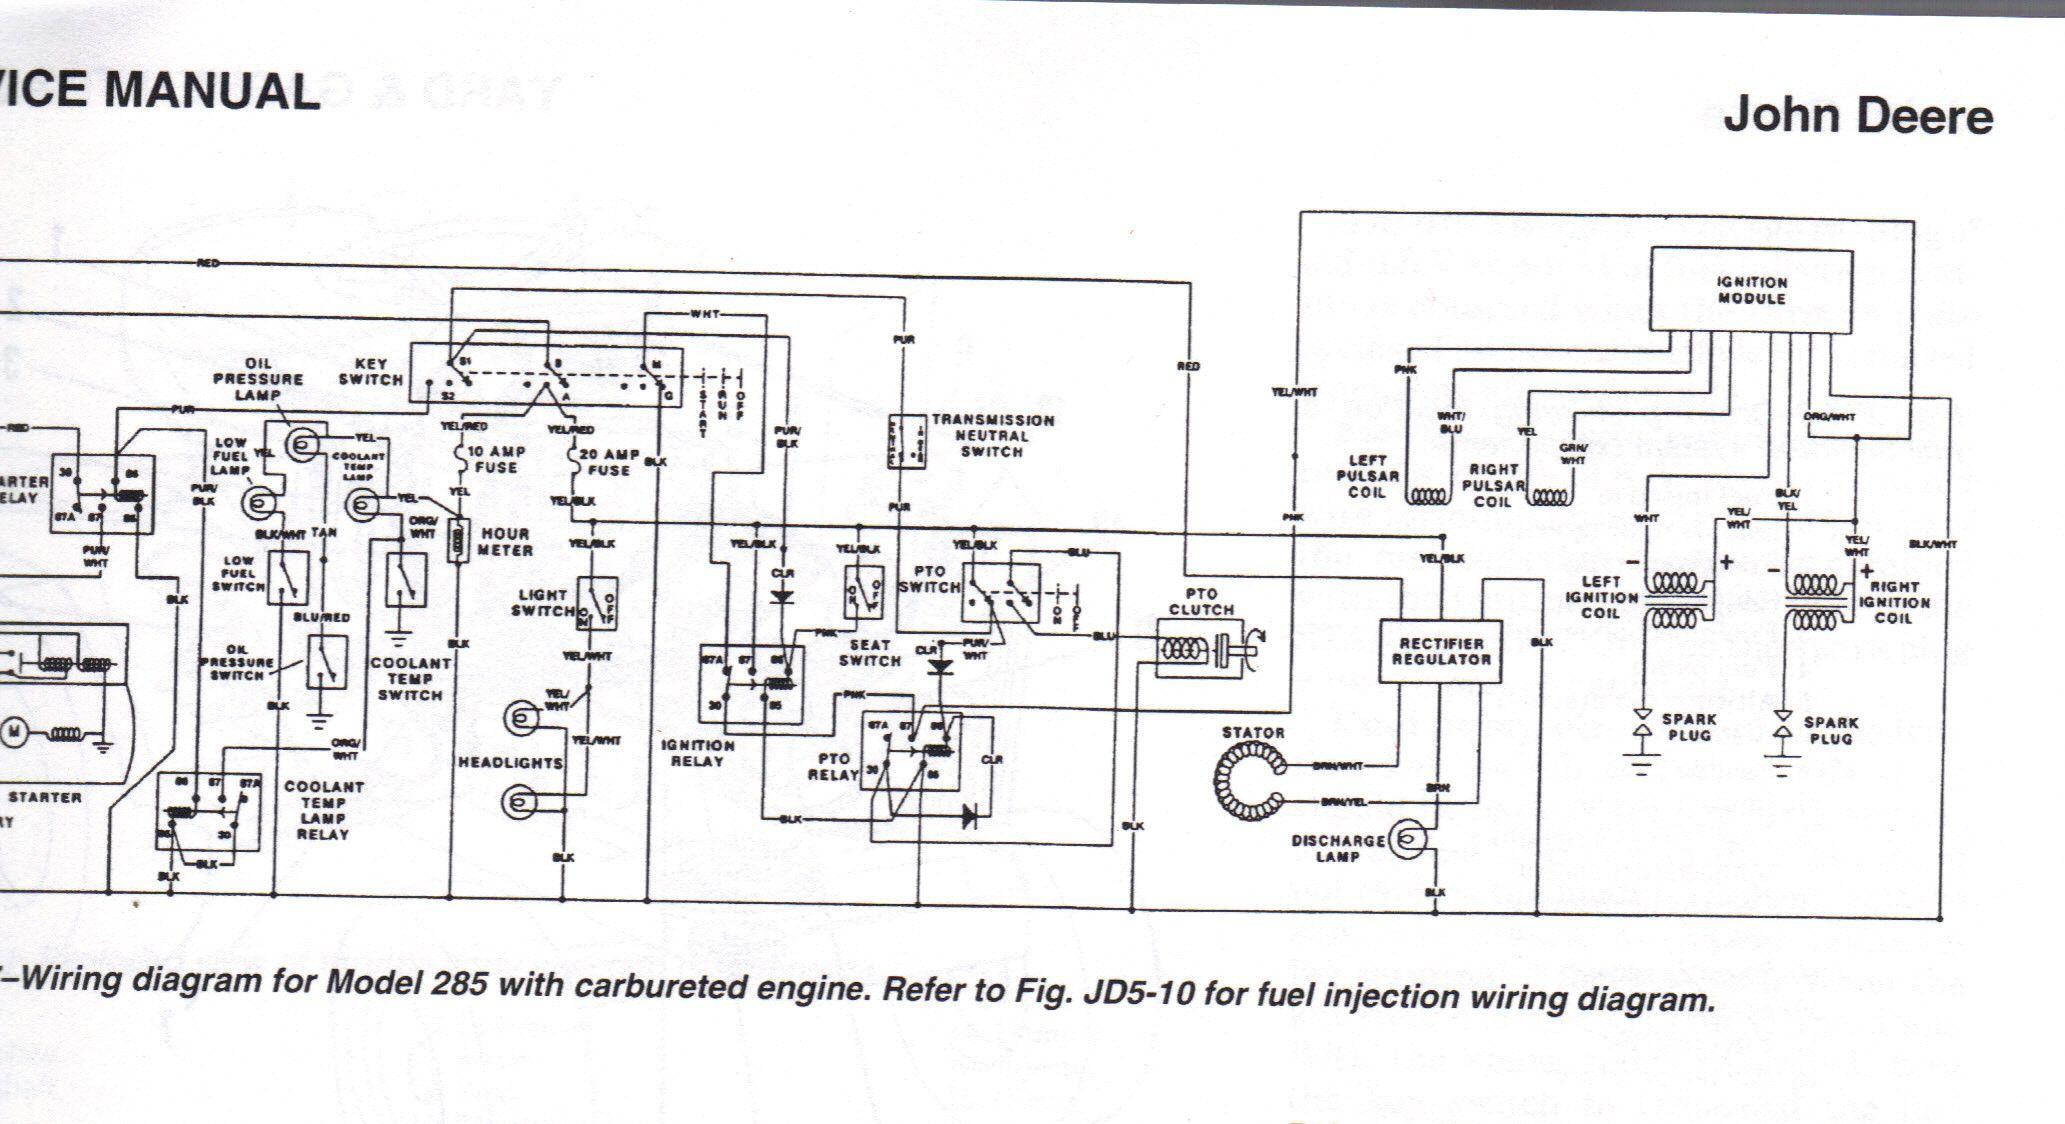 Brilliant John Deere 285 Ignition Wiring Diagram Wiring Diagram Database Wiring Cloud Mousmenurrecoveryedborg